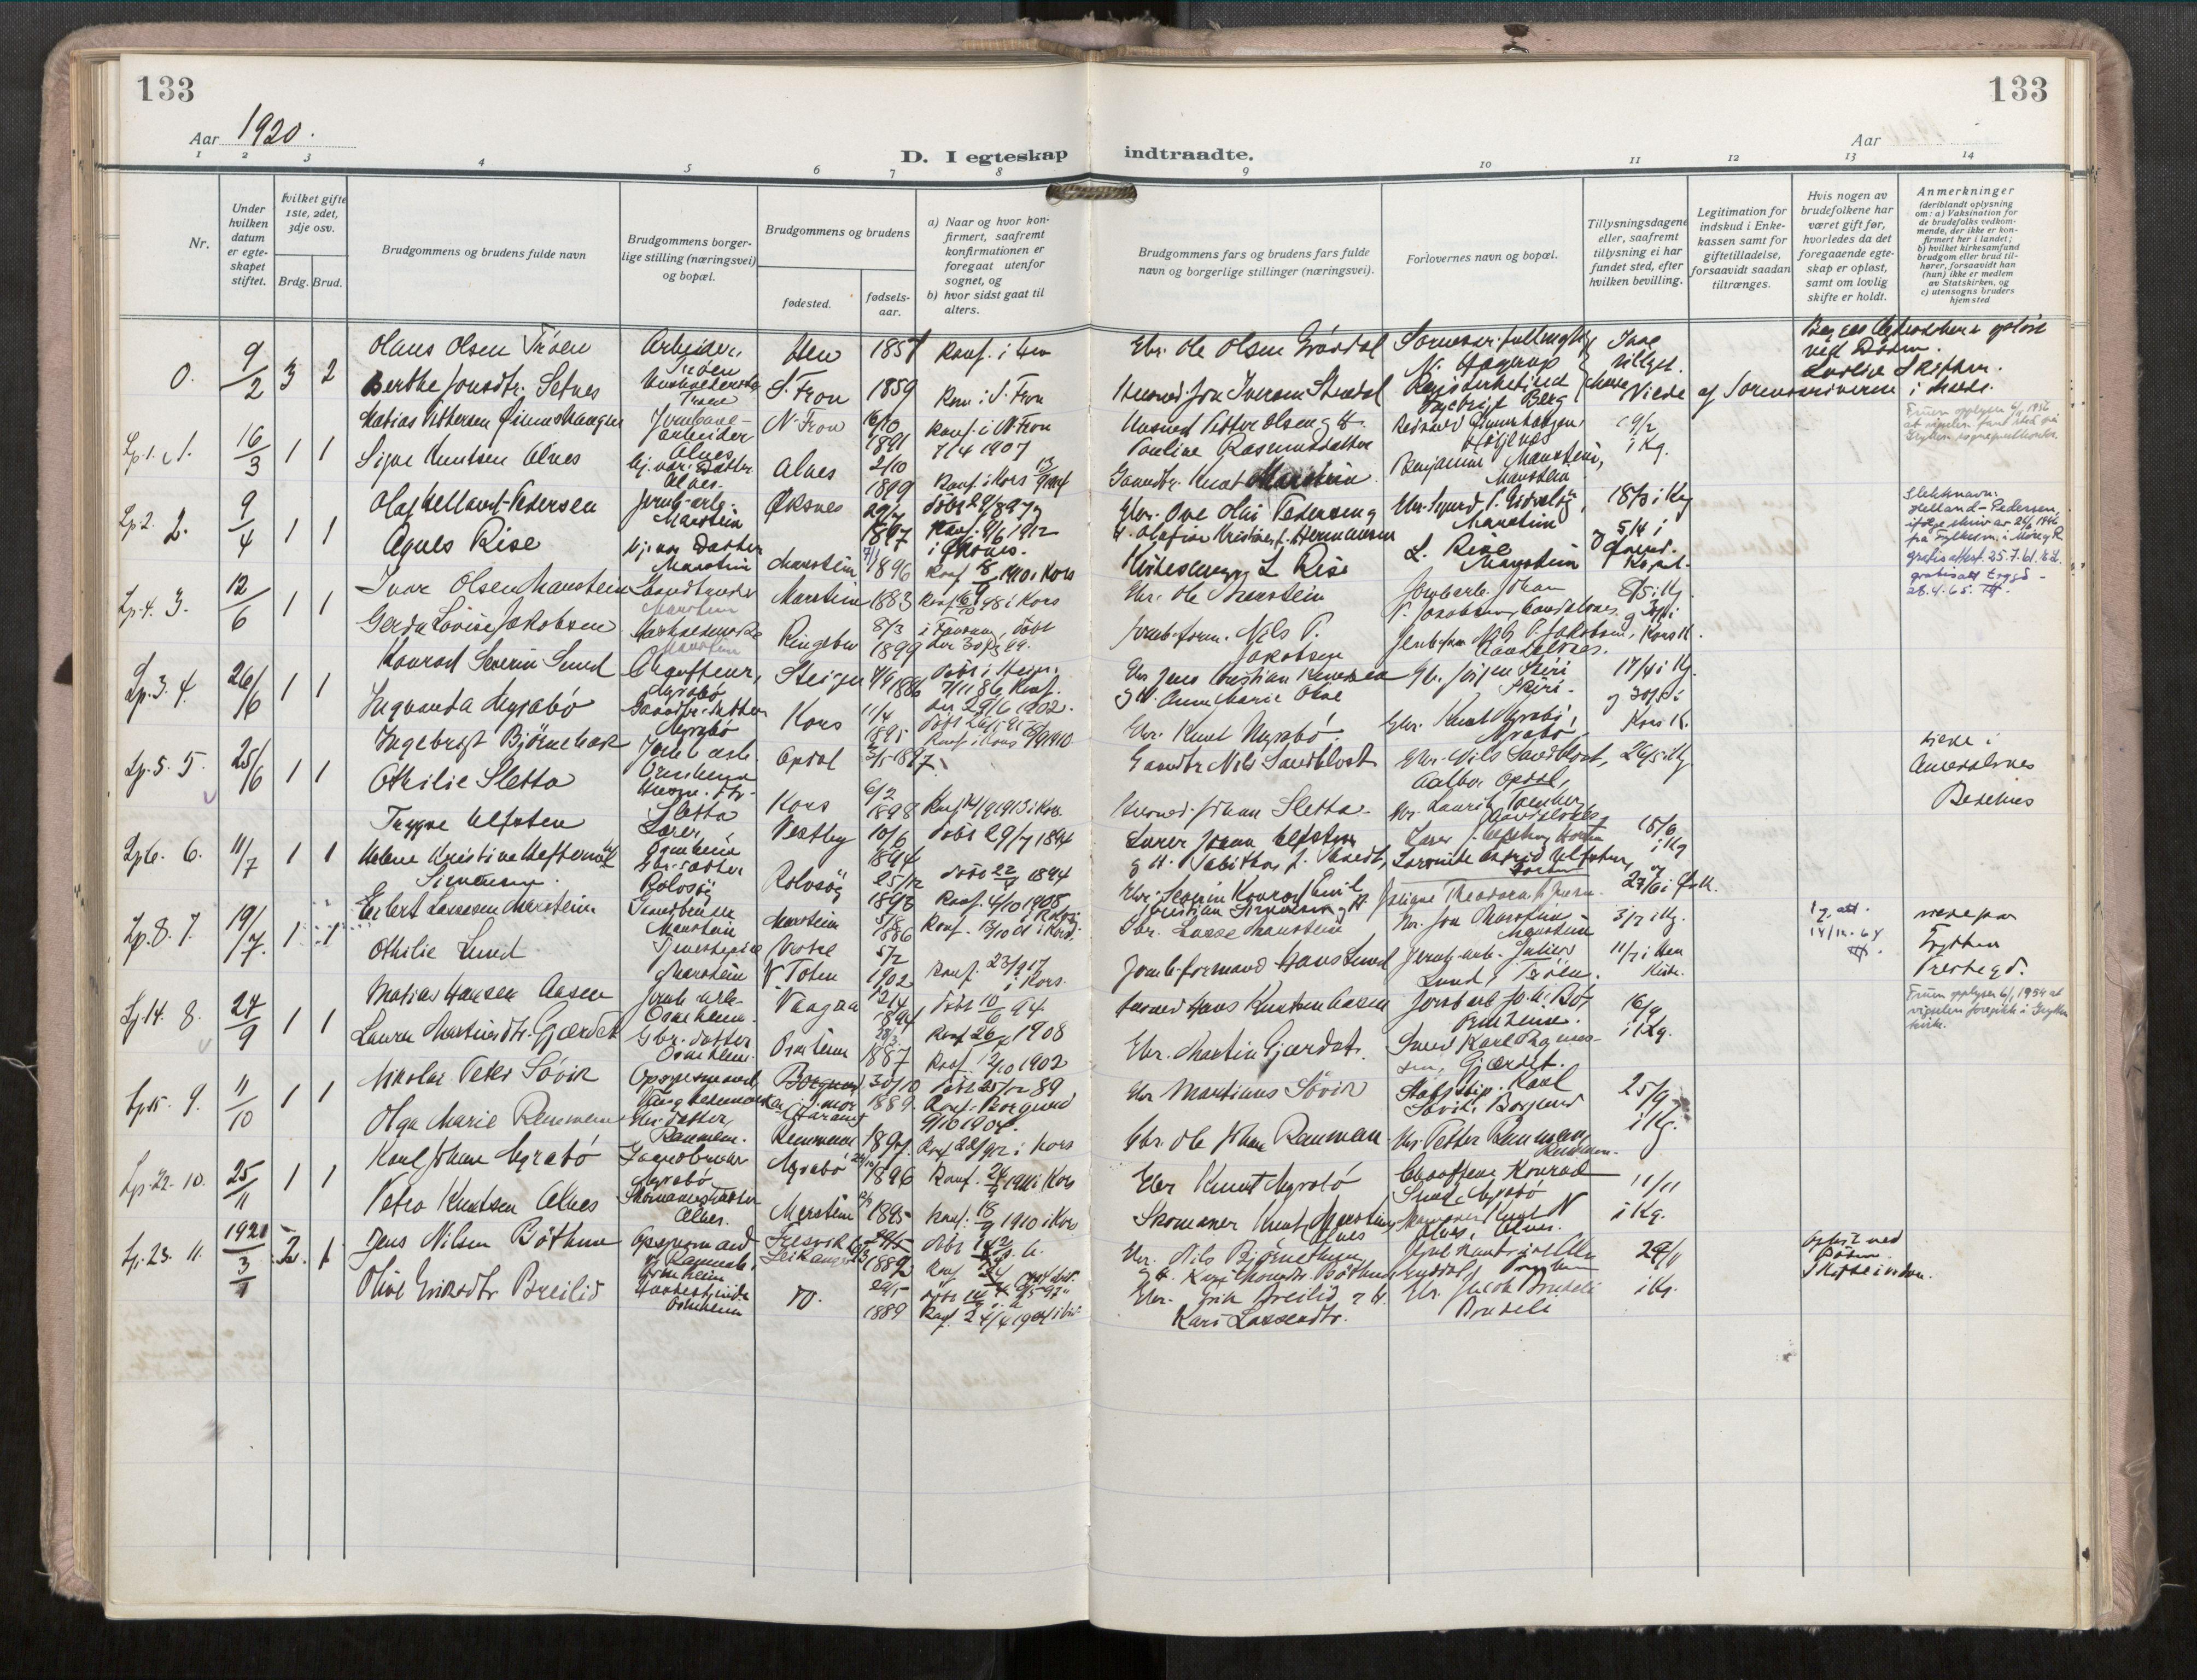 SAT, Grytten sokneprestkontor, Ministerialbok nr. 546A04, 1919-1956, s. 133